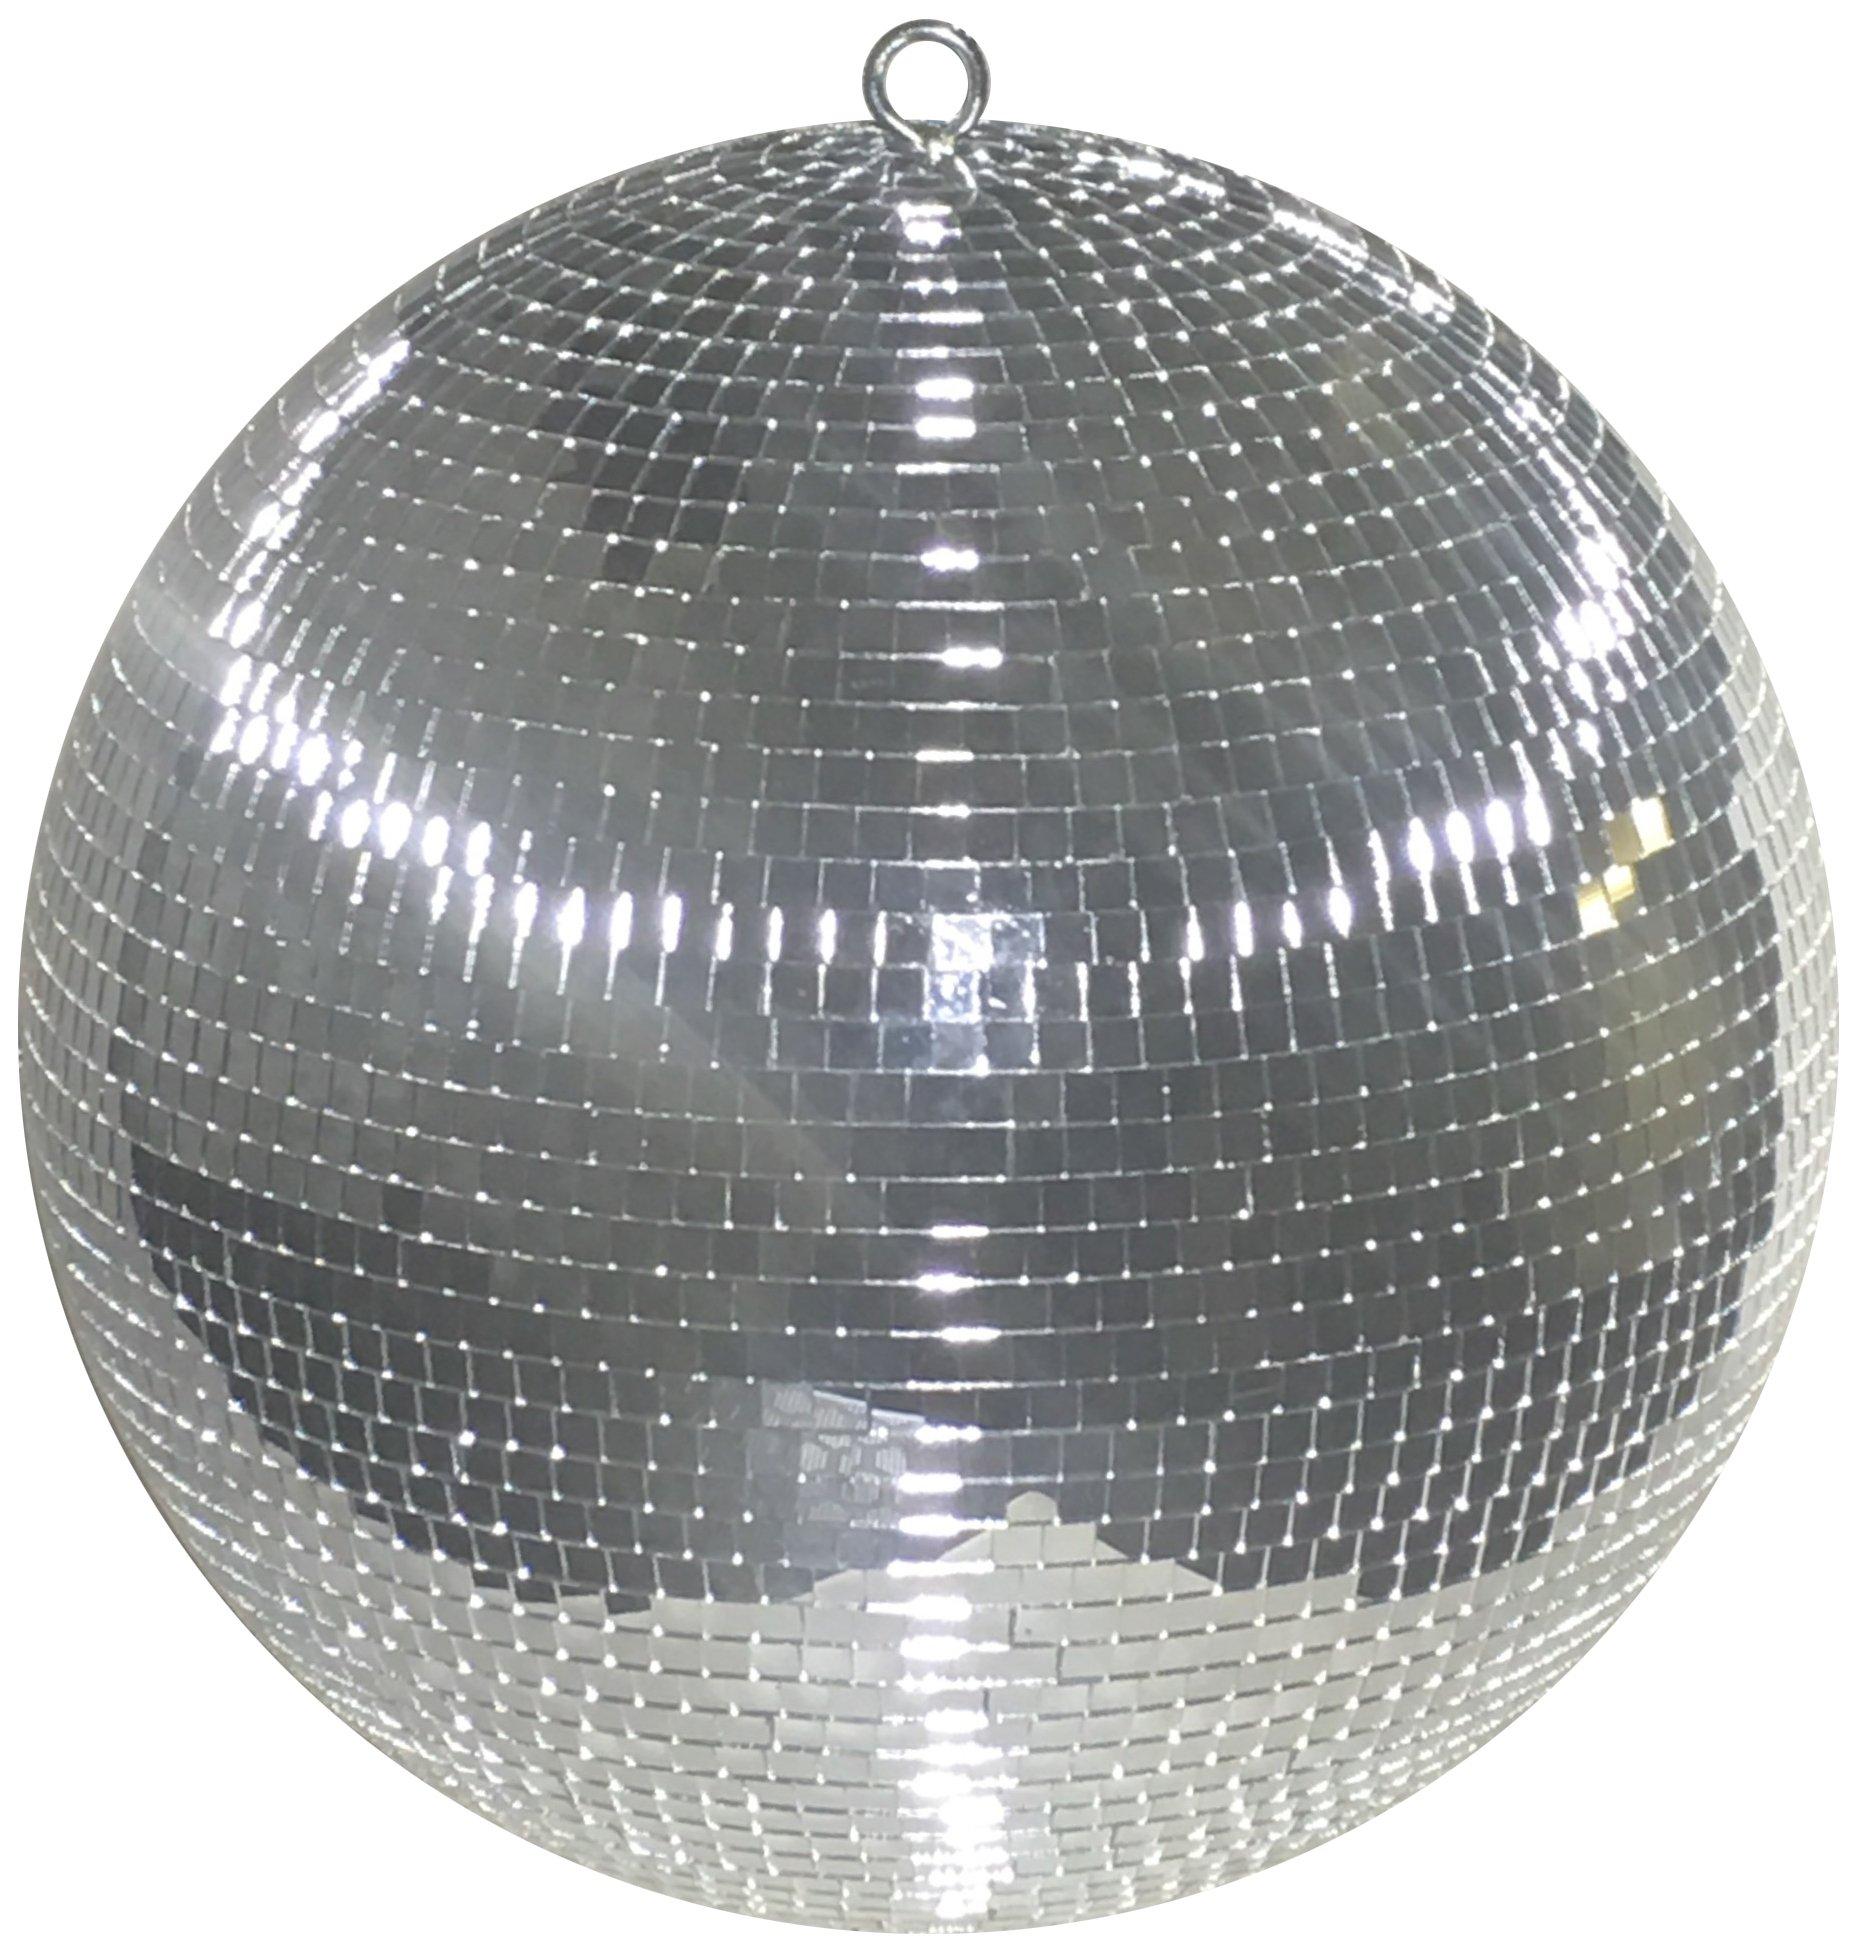 Eliminator Lighting 20'' inch disco mirror ball, 20'' (20'' Ball-EM20) by Eliminator Lighting